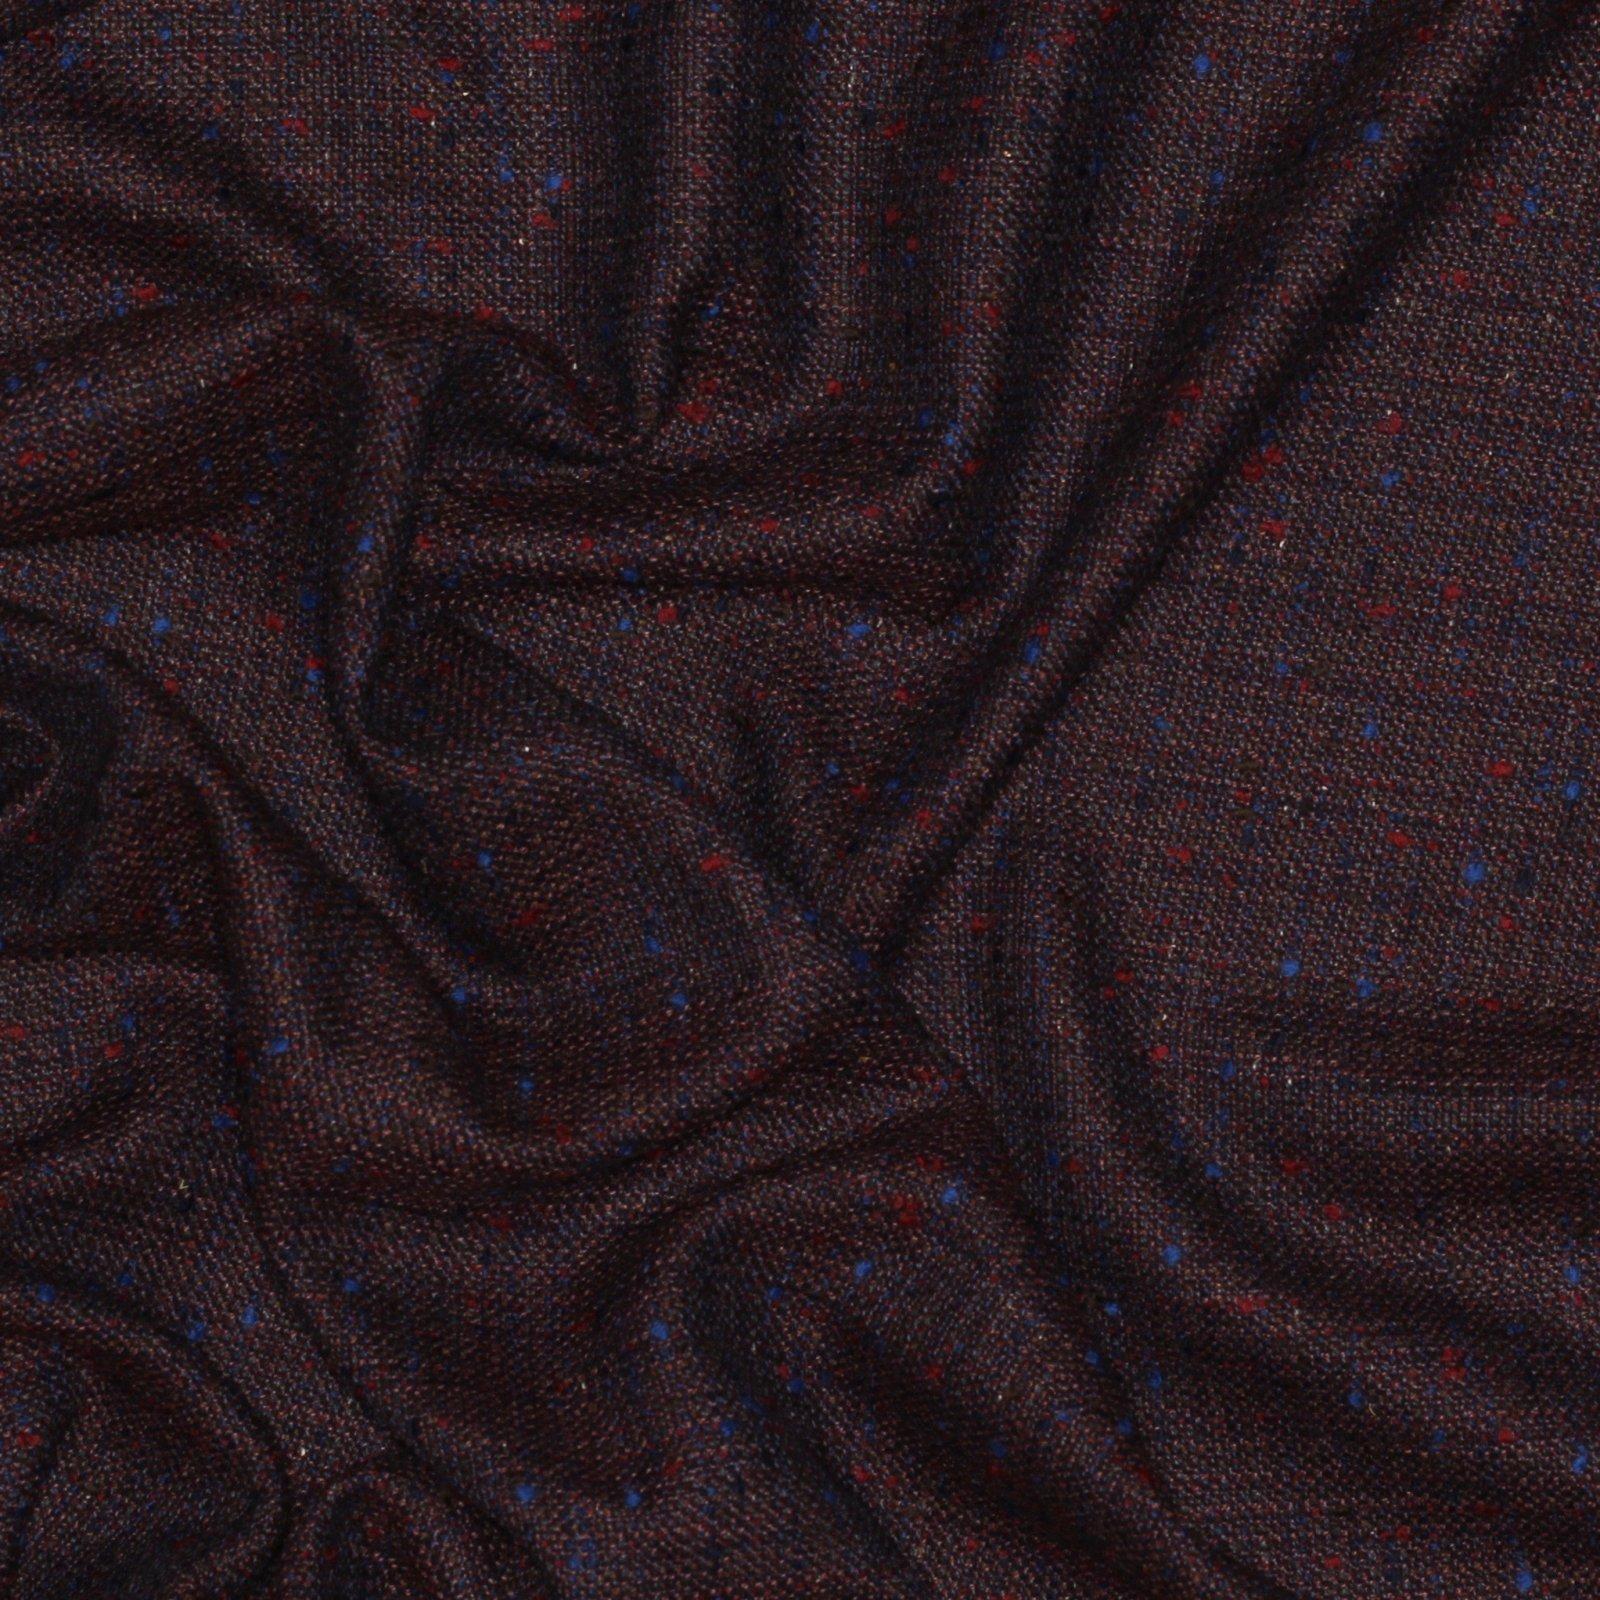 Red/Blue Fleck Italian Wool/Silk Tweed; 60